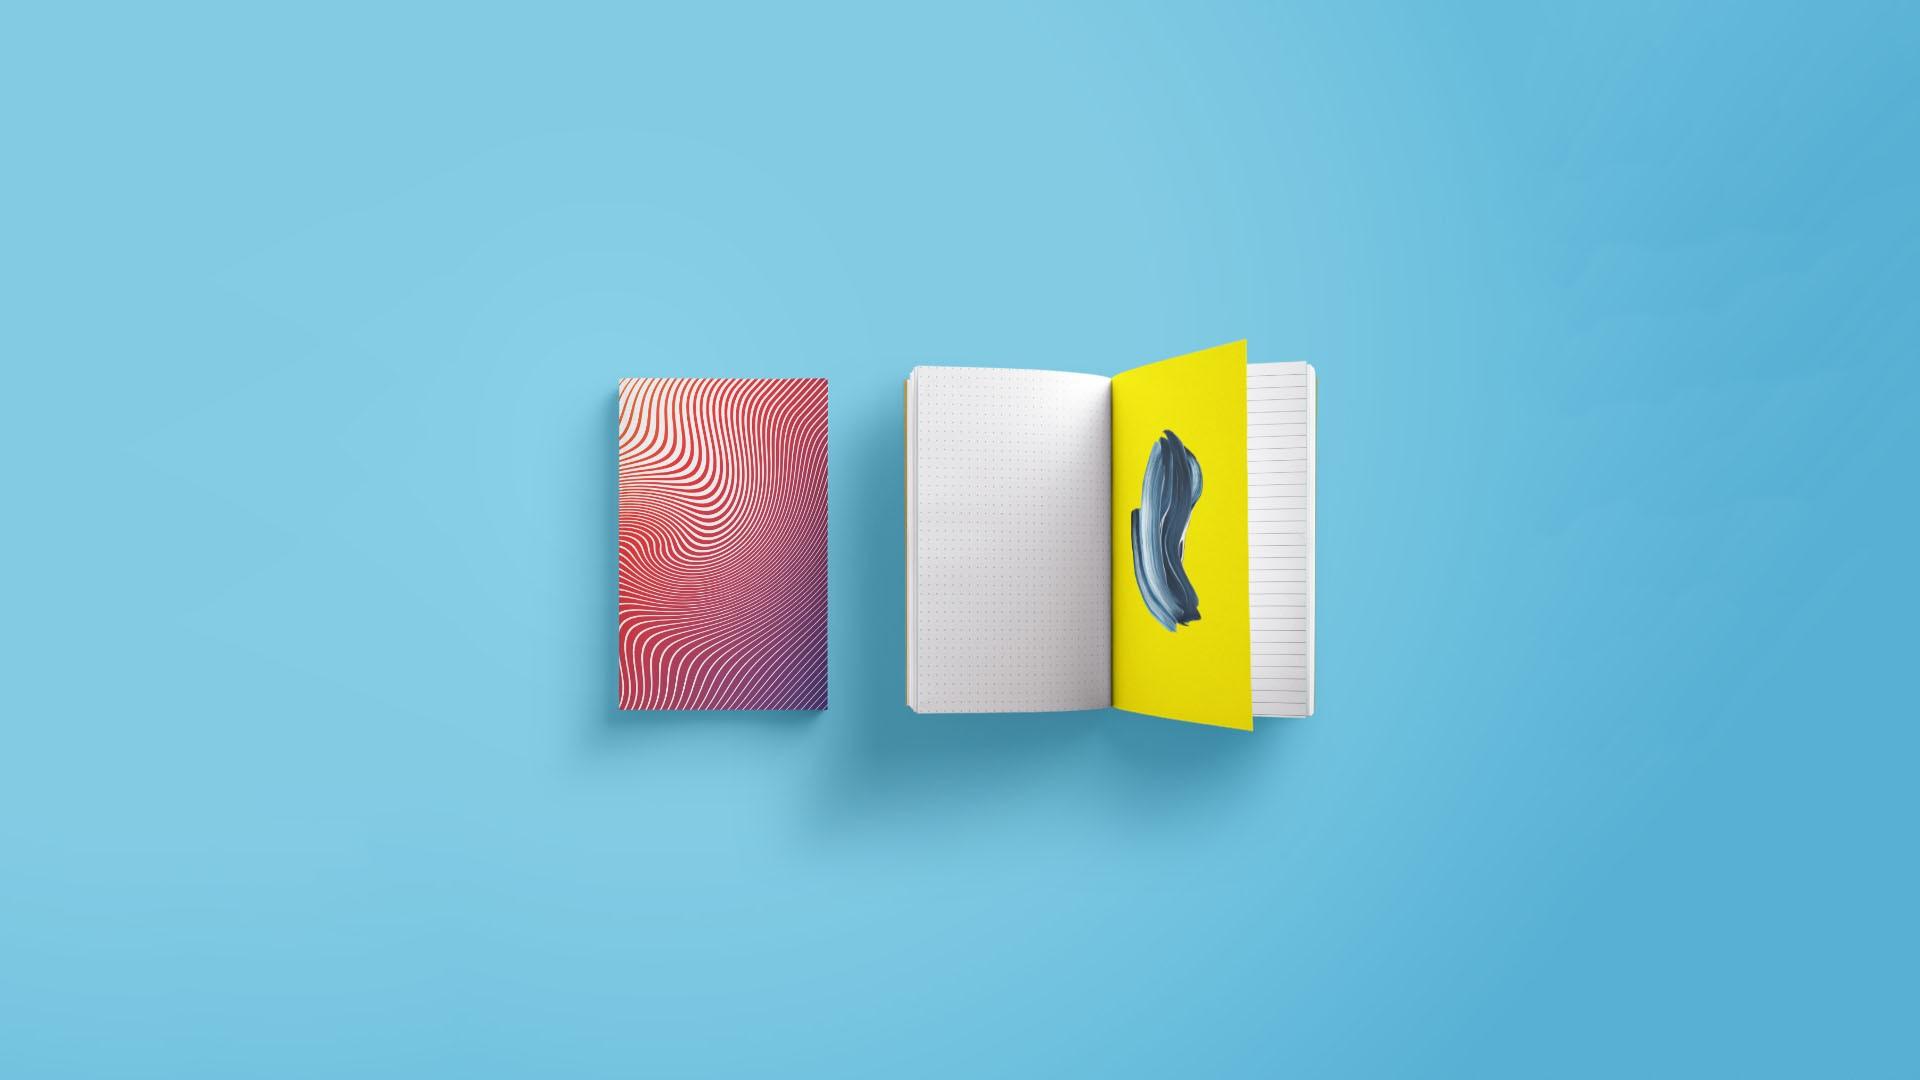 Minimalism Art Notebook download wallpaper image